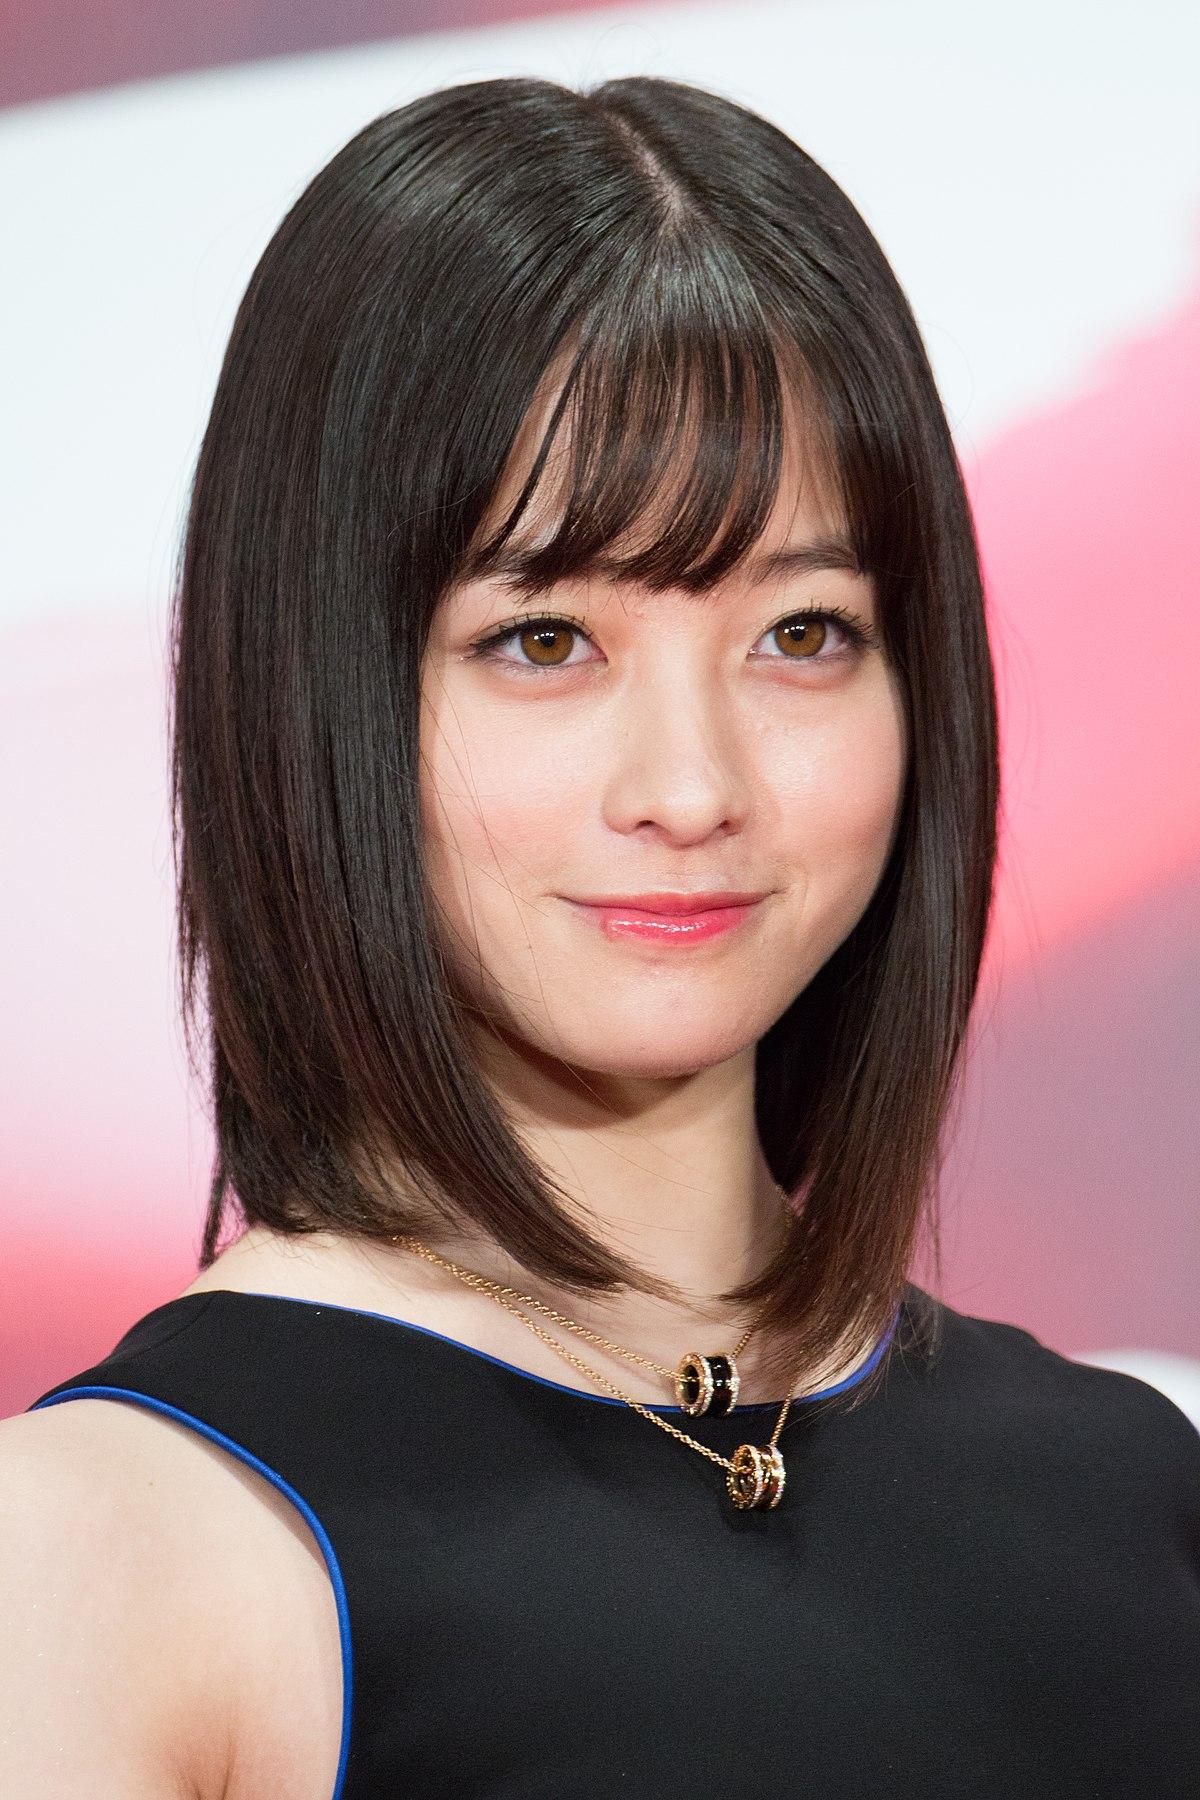 Kanna Hashimoto - Wikipedia